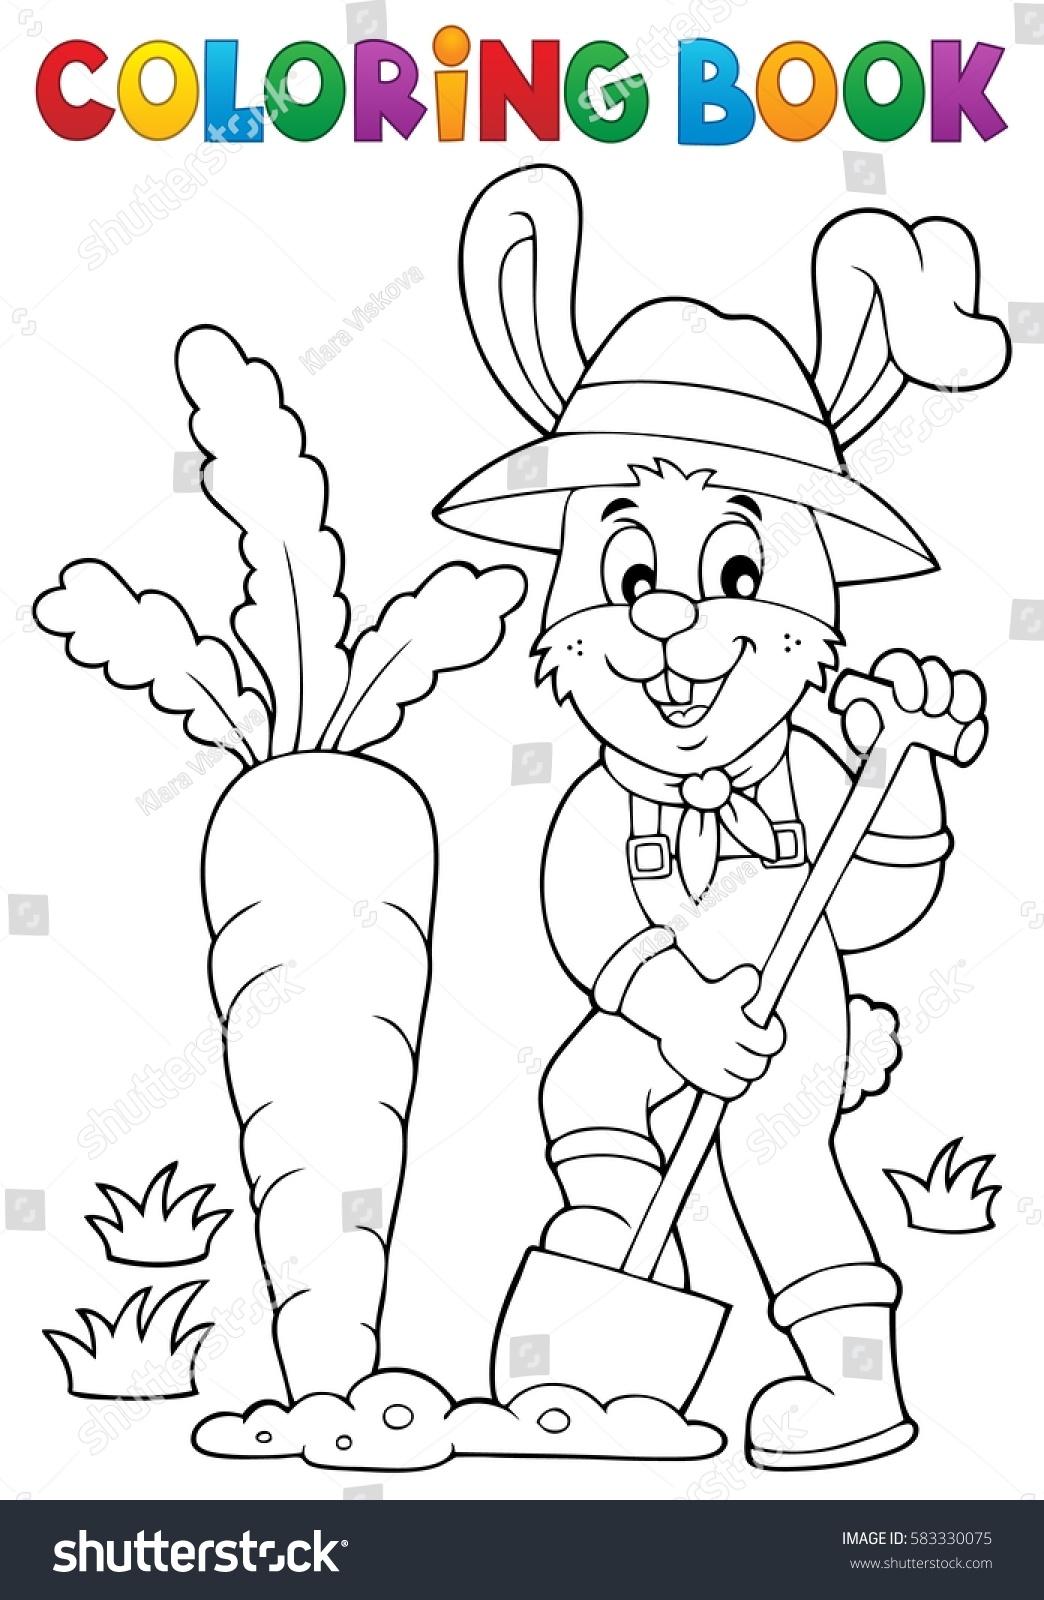 coloring book rabbit gardener theme 1 eps10 vector illustration